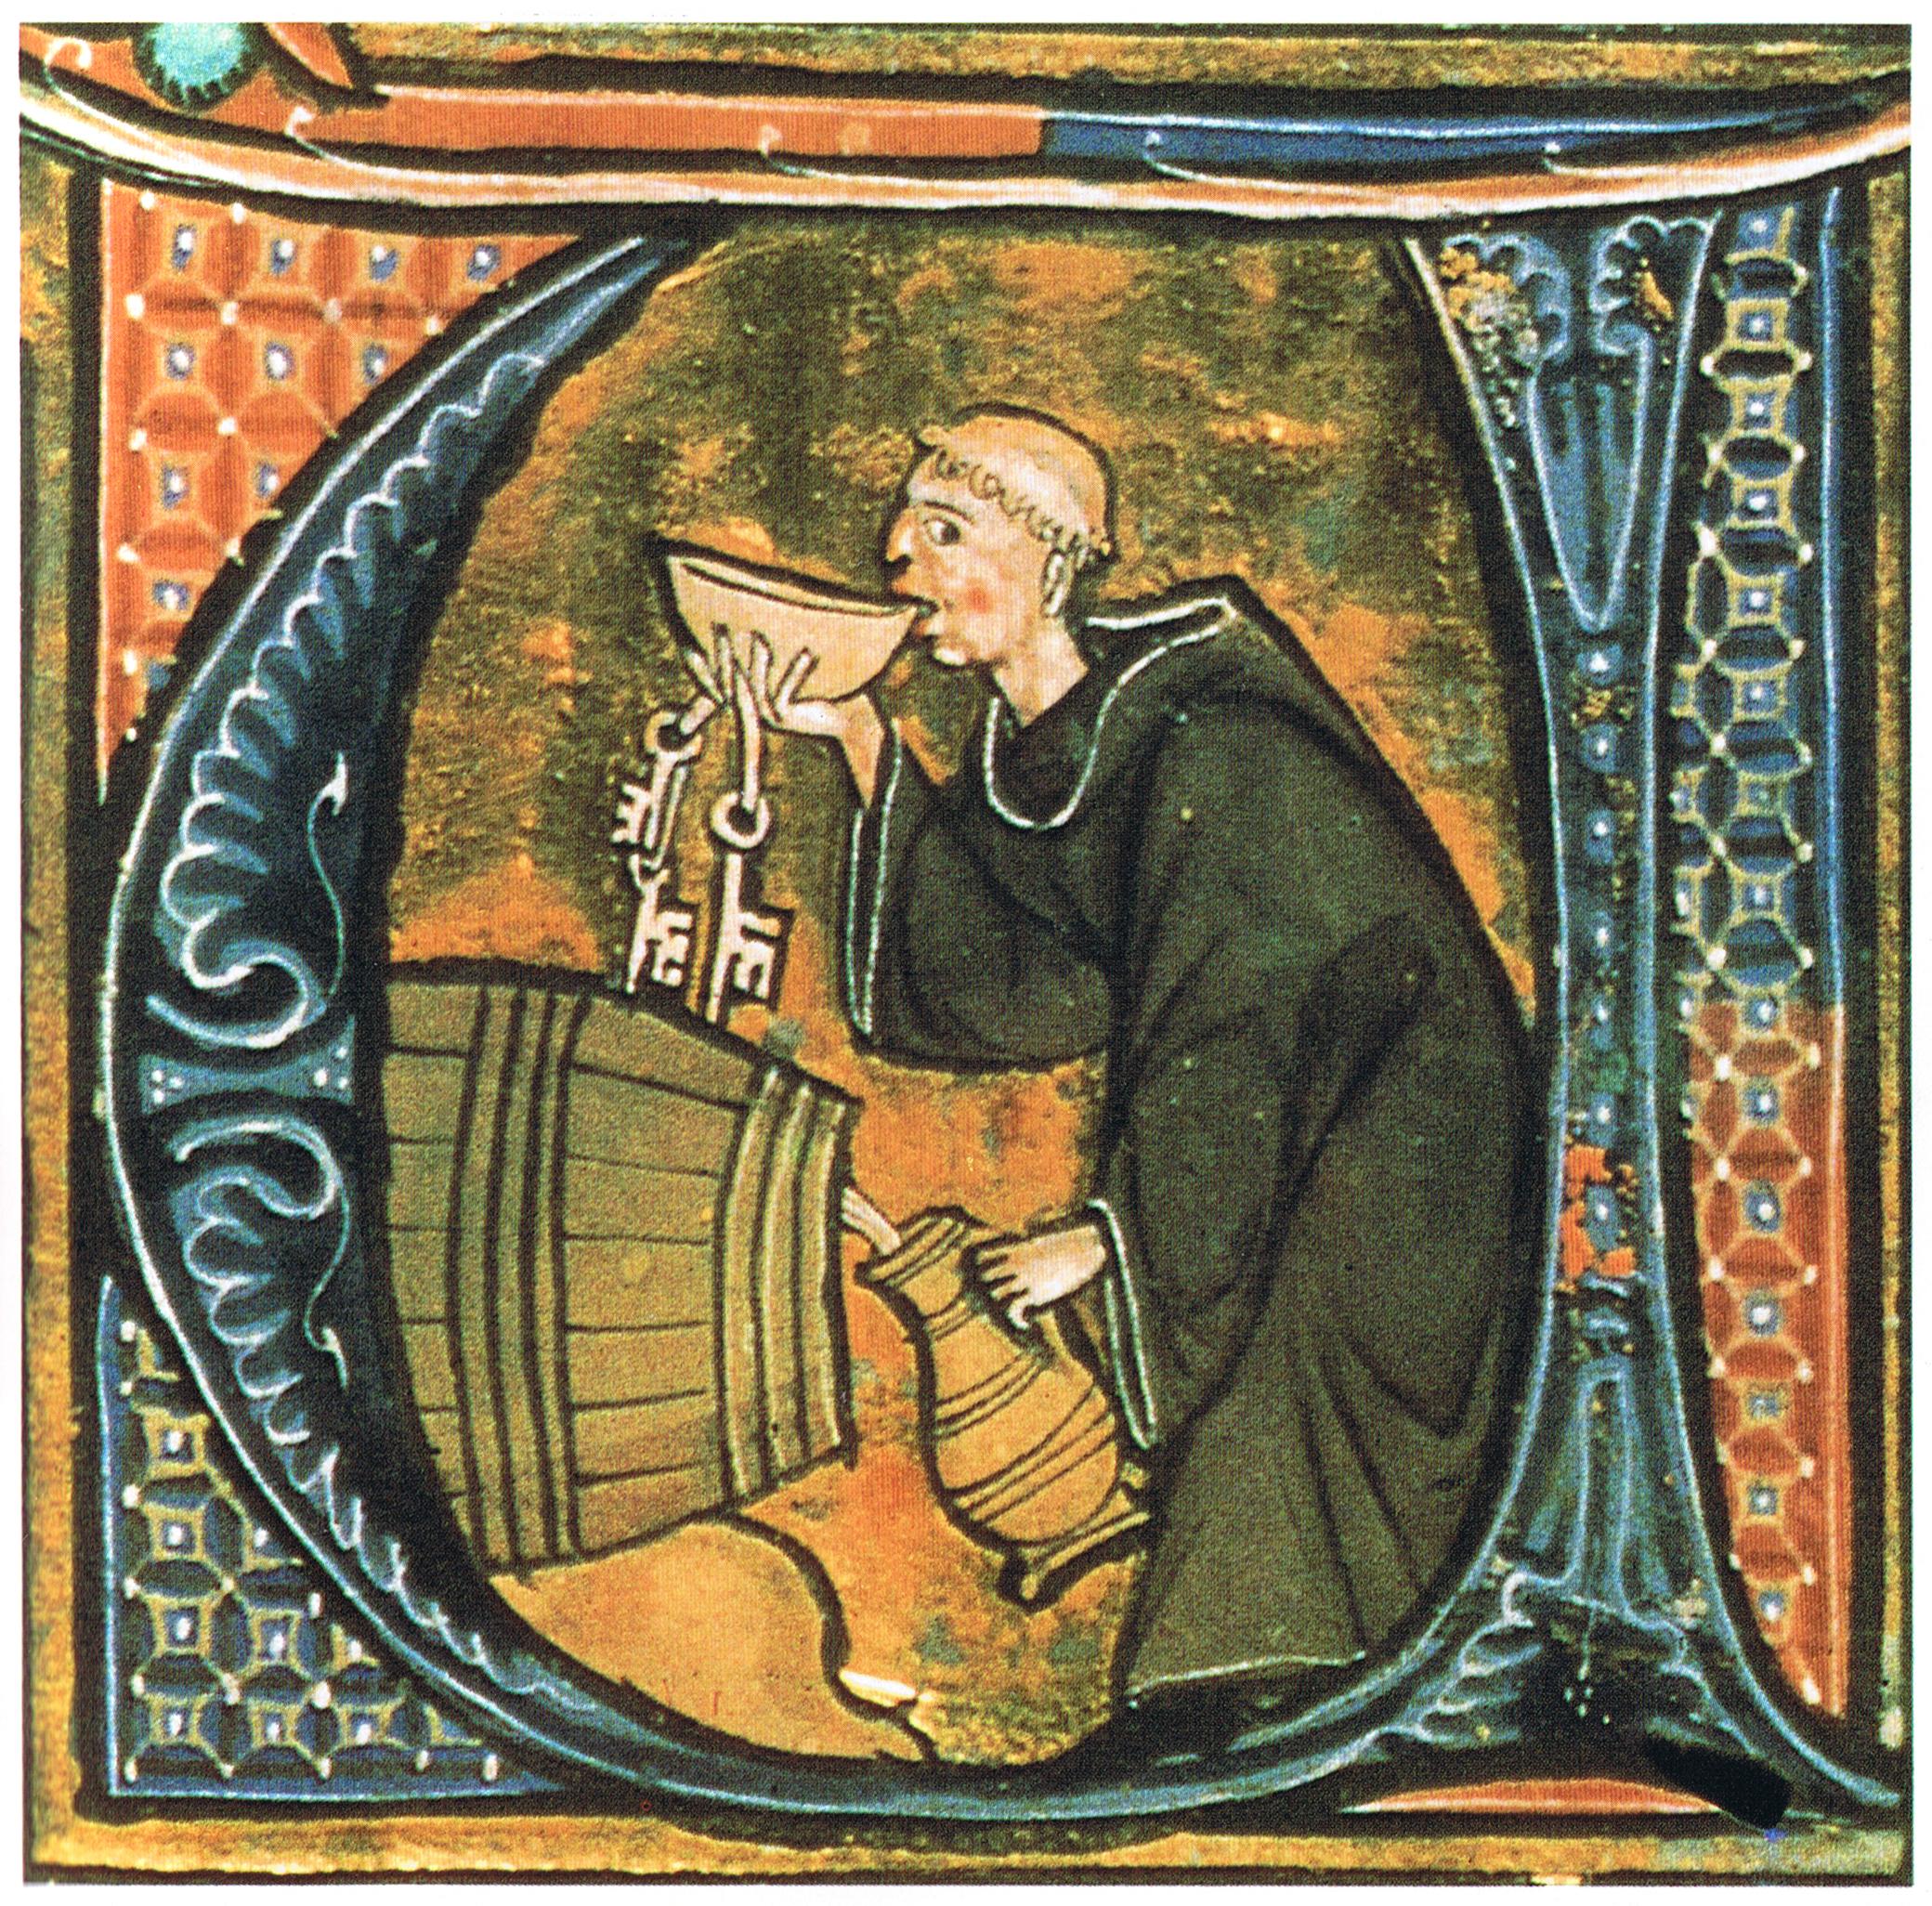 Monk_sneaking_a_drink